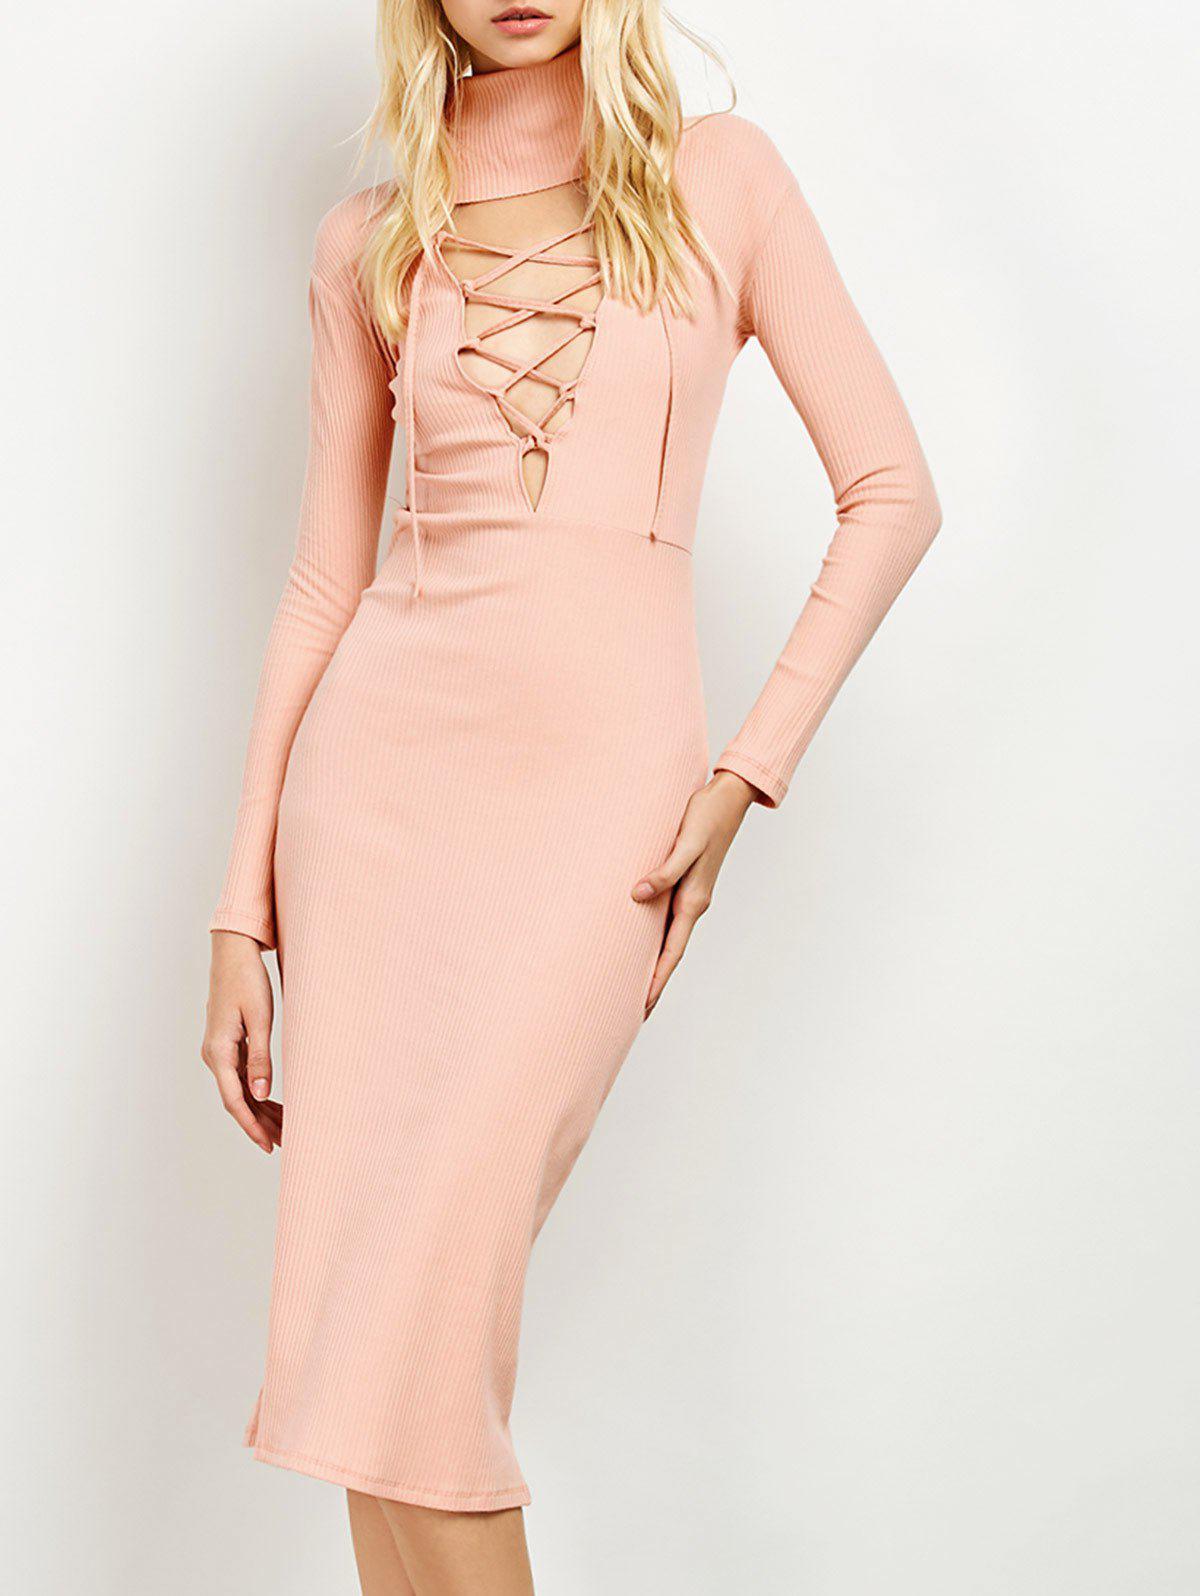 Turtleneck Ribbed Knit Midi Bodycon Dress 201247303